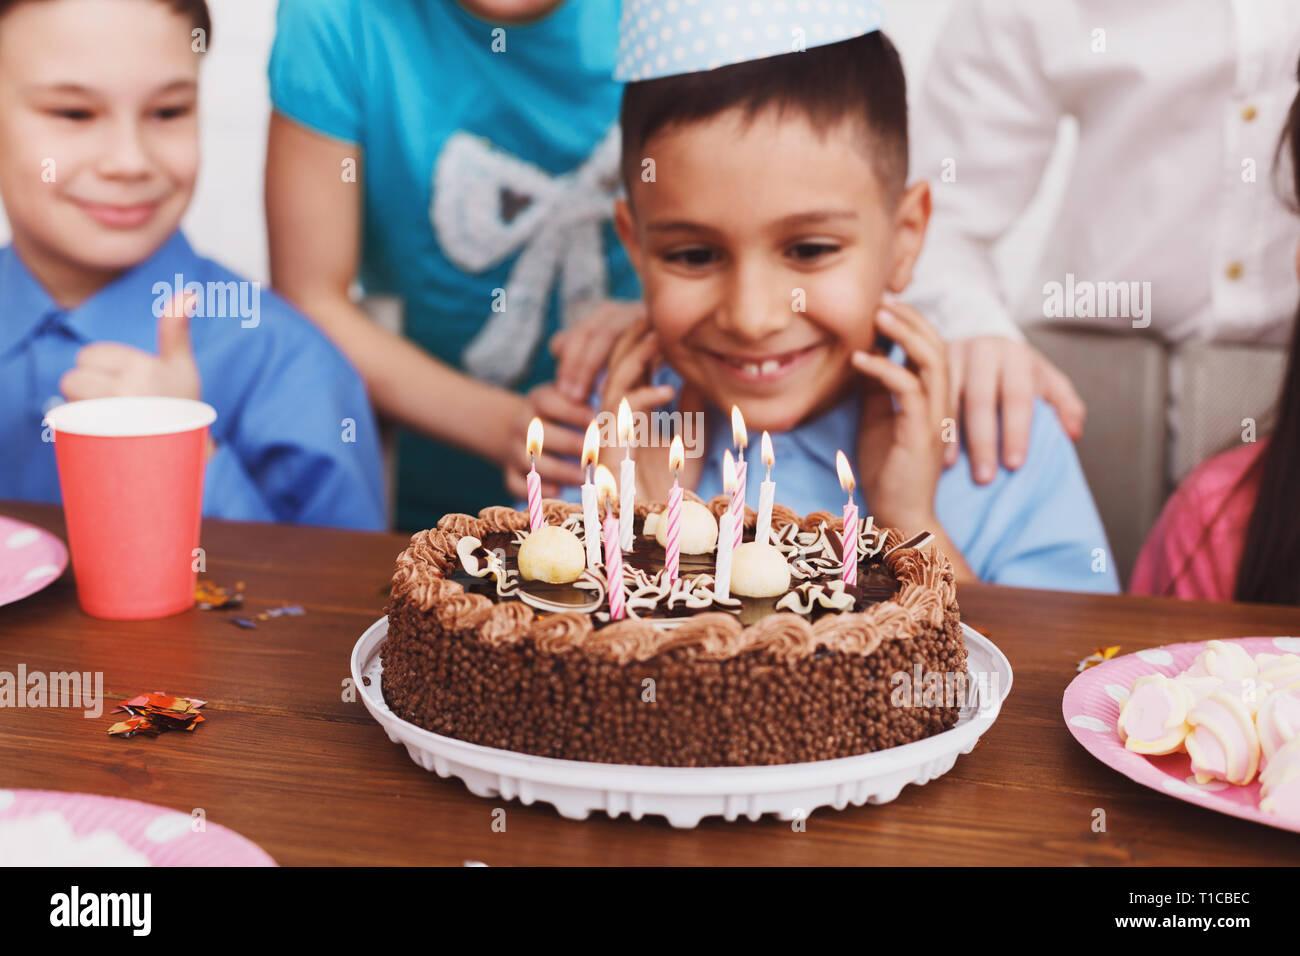 Outstanding Birthday Cake Boy Celebrating B Day And Making Wish Stock Photo Birthday Cards Printable Benkemecafe Filternl